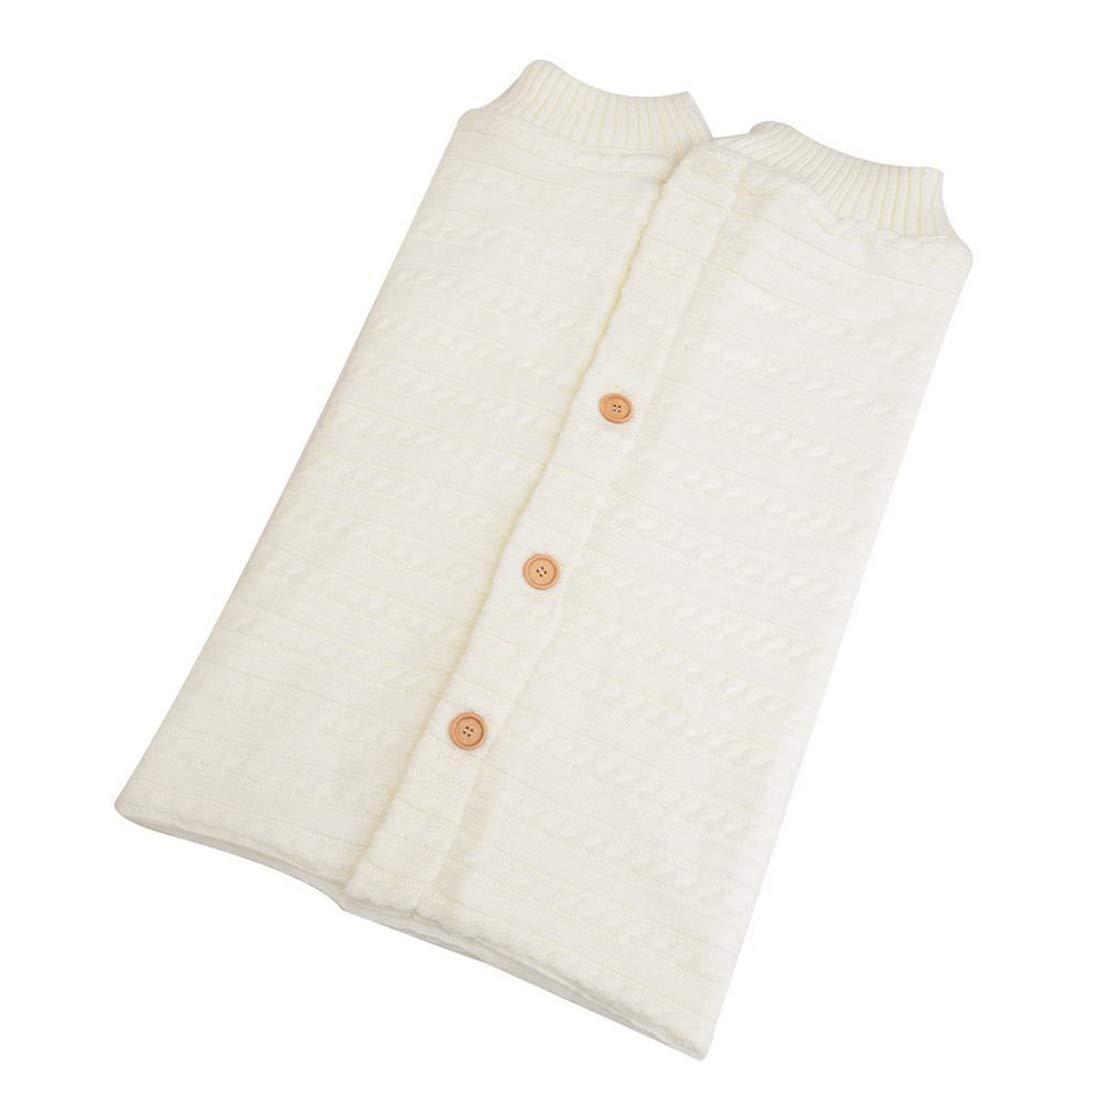 Unisex Swaddle Blanket Beb/é Reci/én Nacido de 0-6 Meses para Cochecito Invierno Caliente C/ómodo Mantas Envolventes Saco de Dormir de Punto Felpa